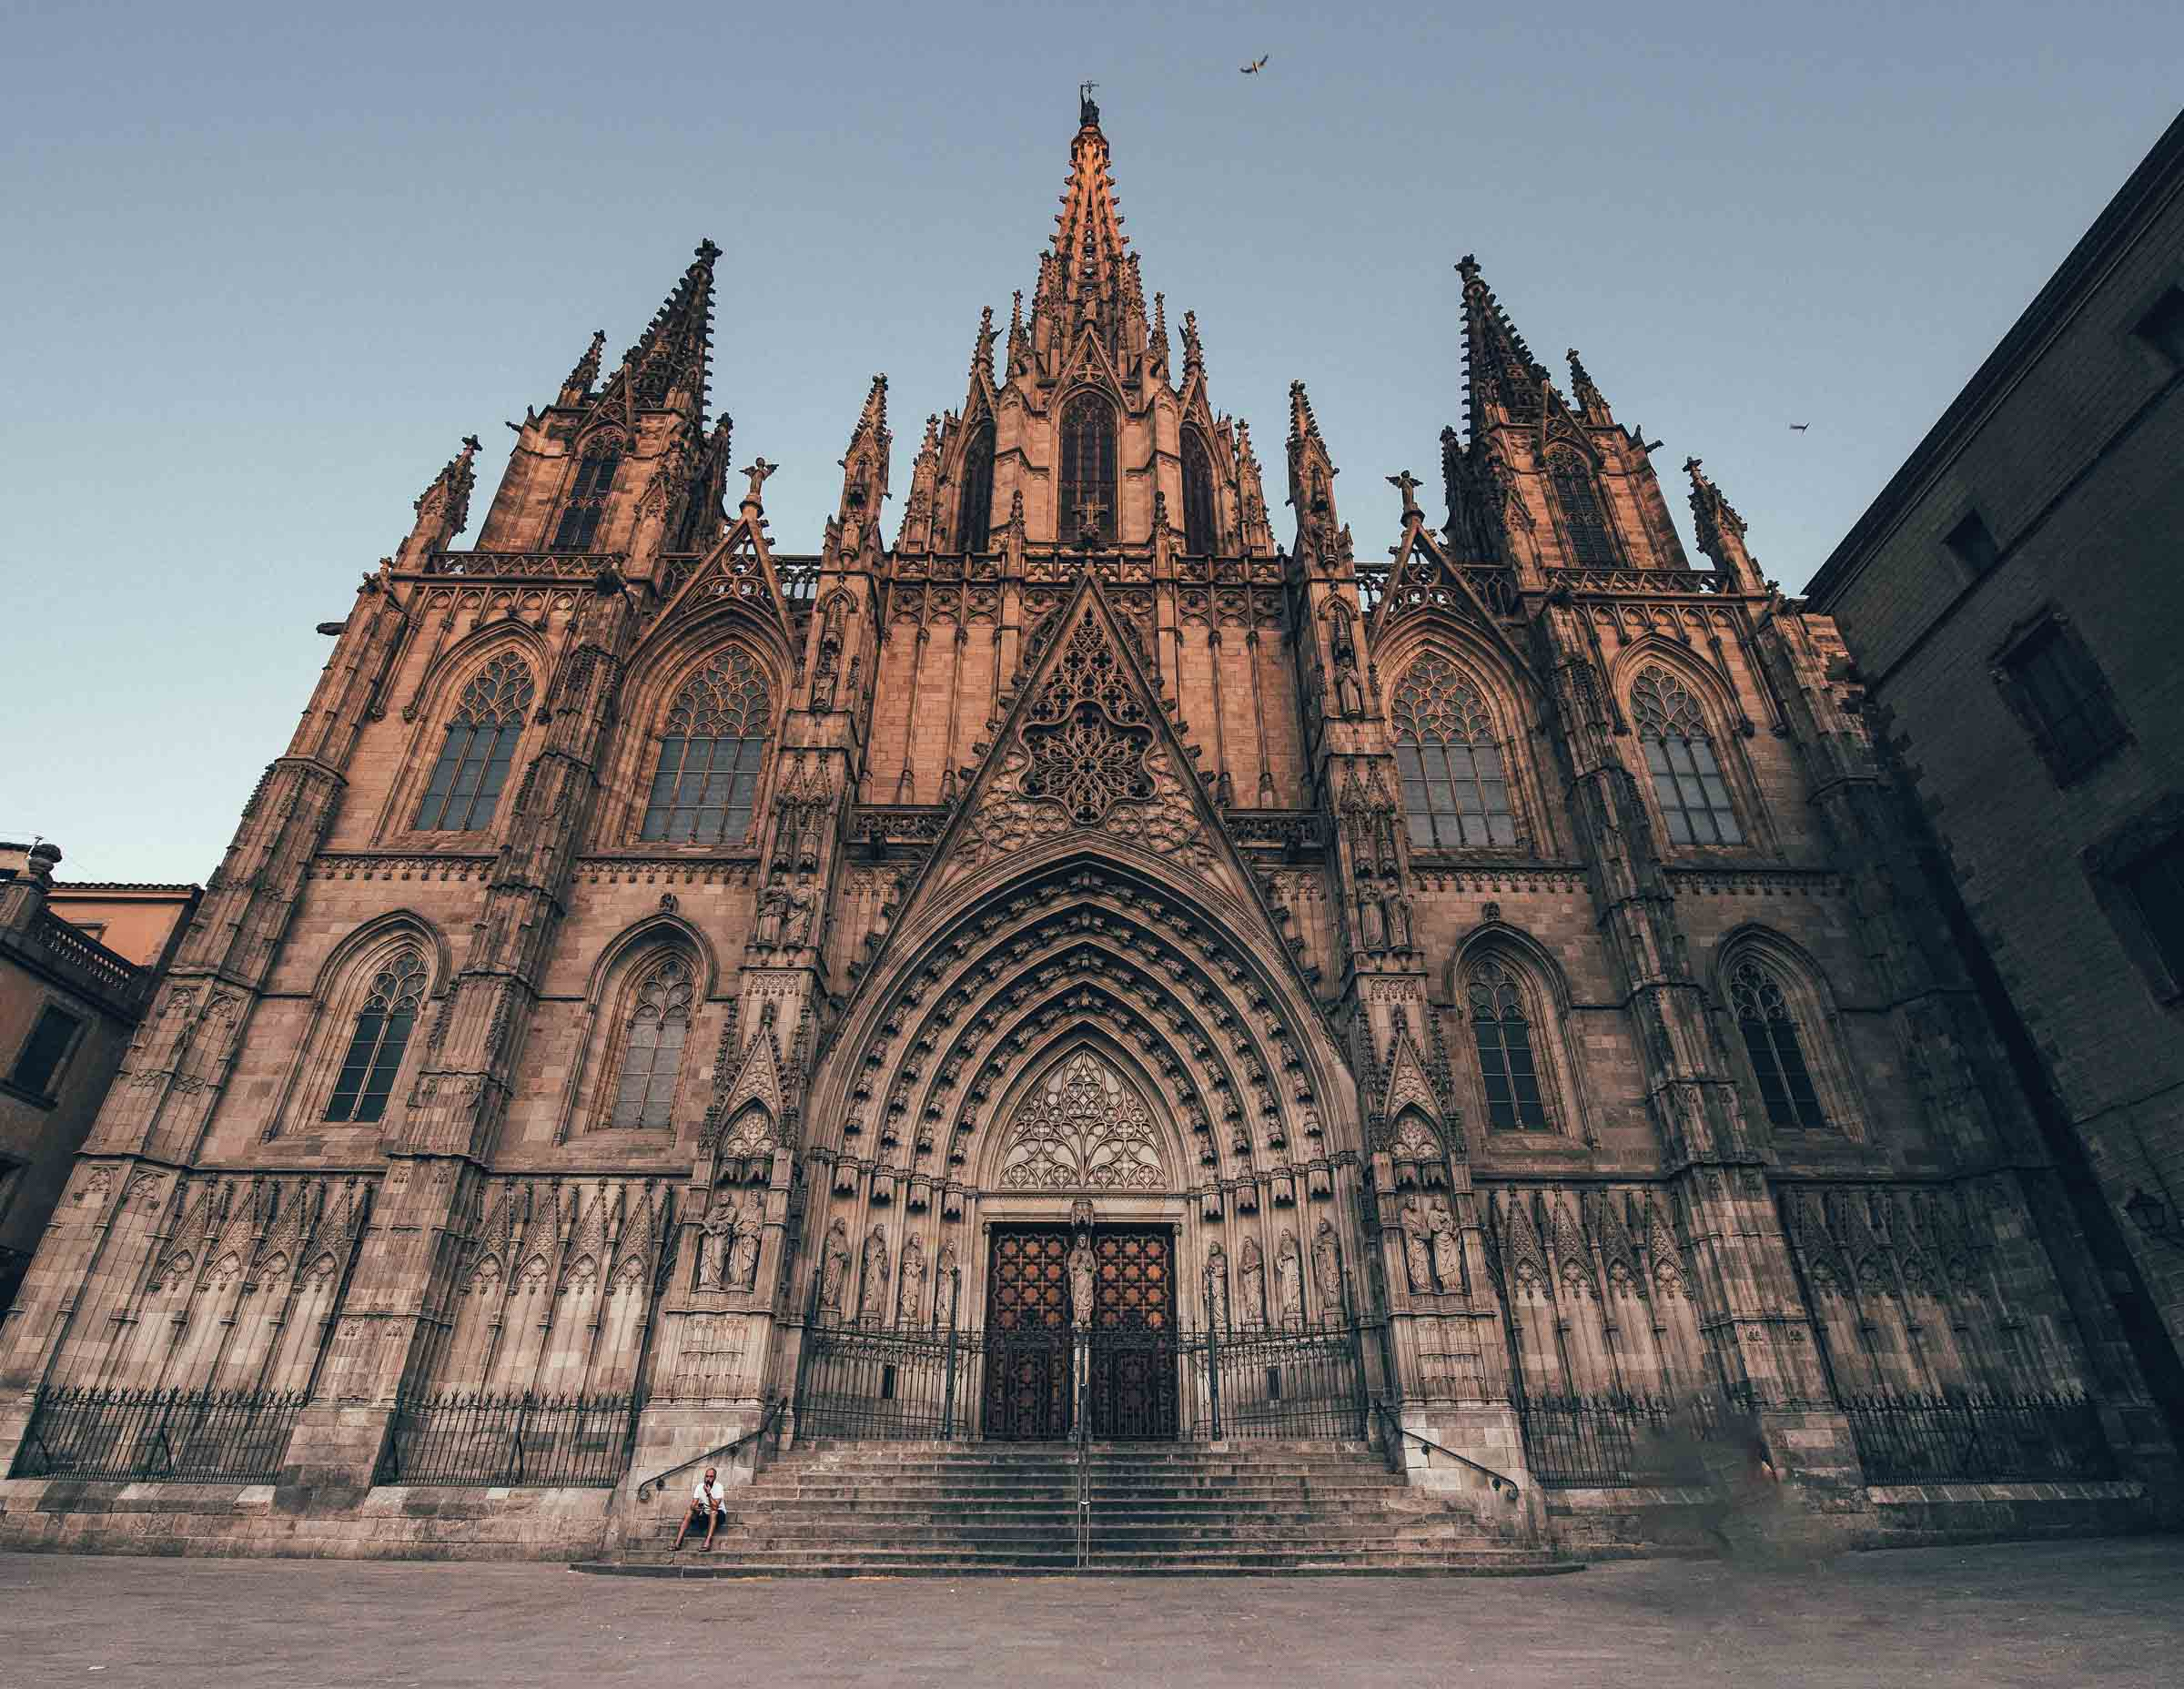 El Catedral de Santa Eulali - 2 Days in Barcelona